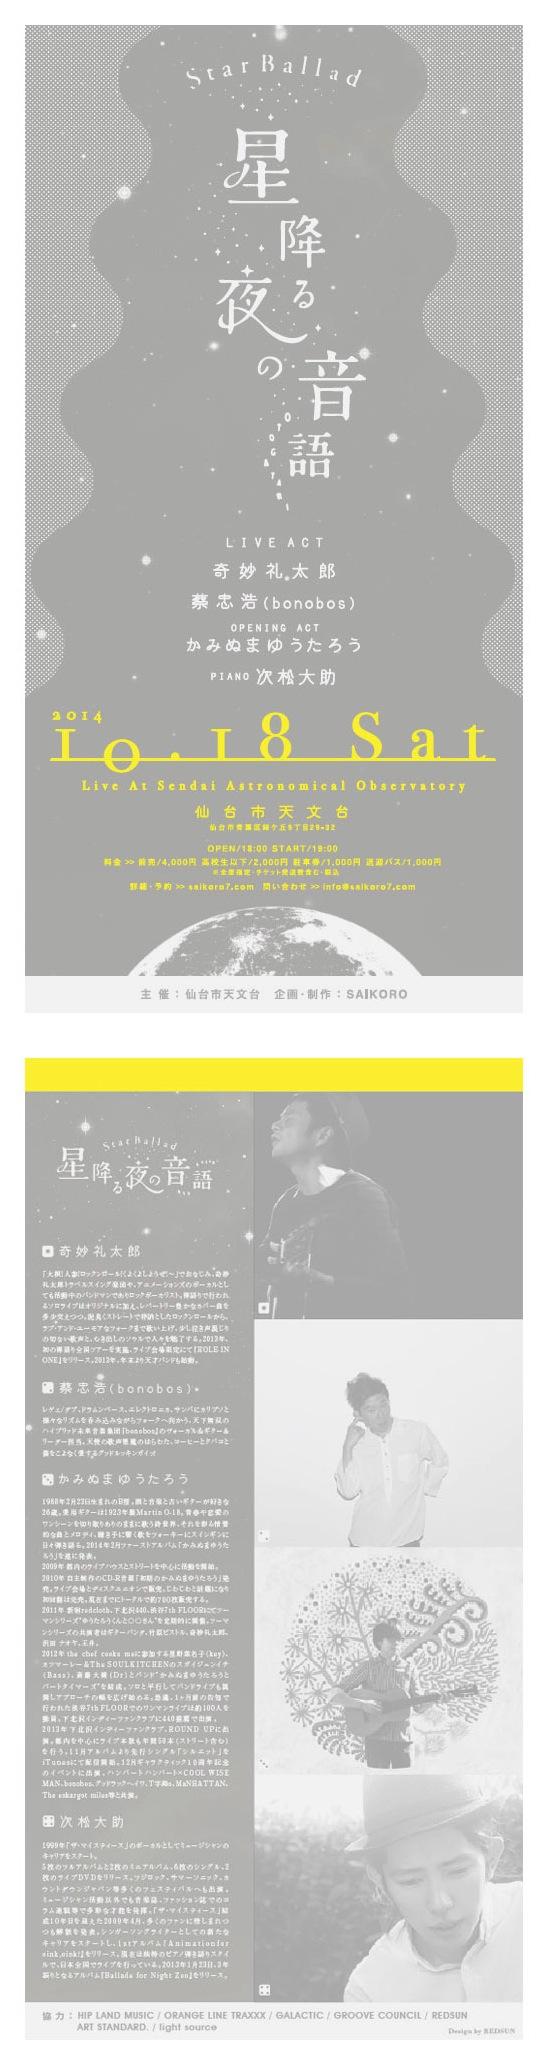 SAIKORO presents LIVE EVENT / Star Ballad 〜星降る夜の音語り〜 / Live Act : 奇妙礼太郎 蔡忠浩 かみぬまゆうたろう 次松大助 / 仙台市天文台 / Design : Redsun 三浦正昭